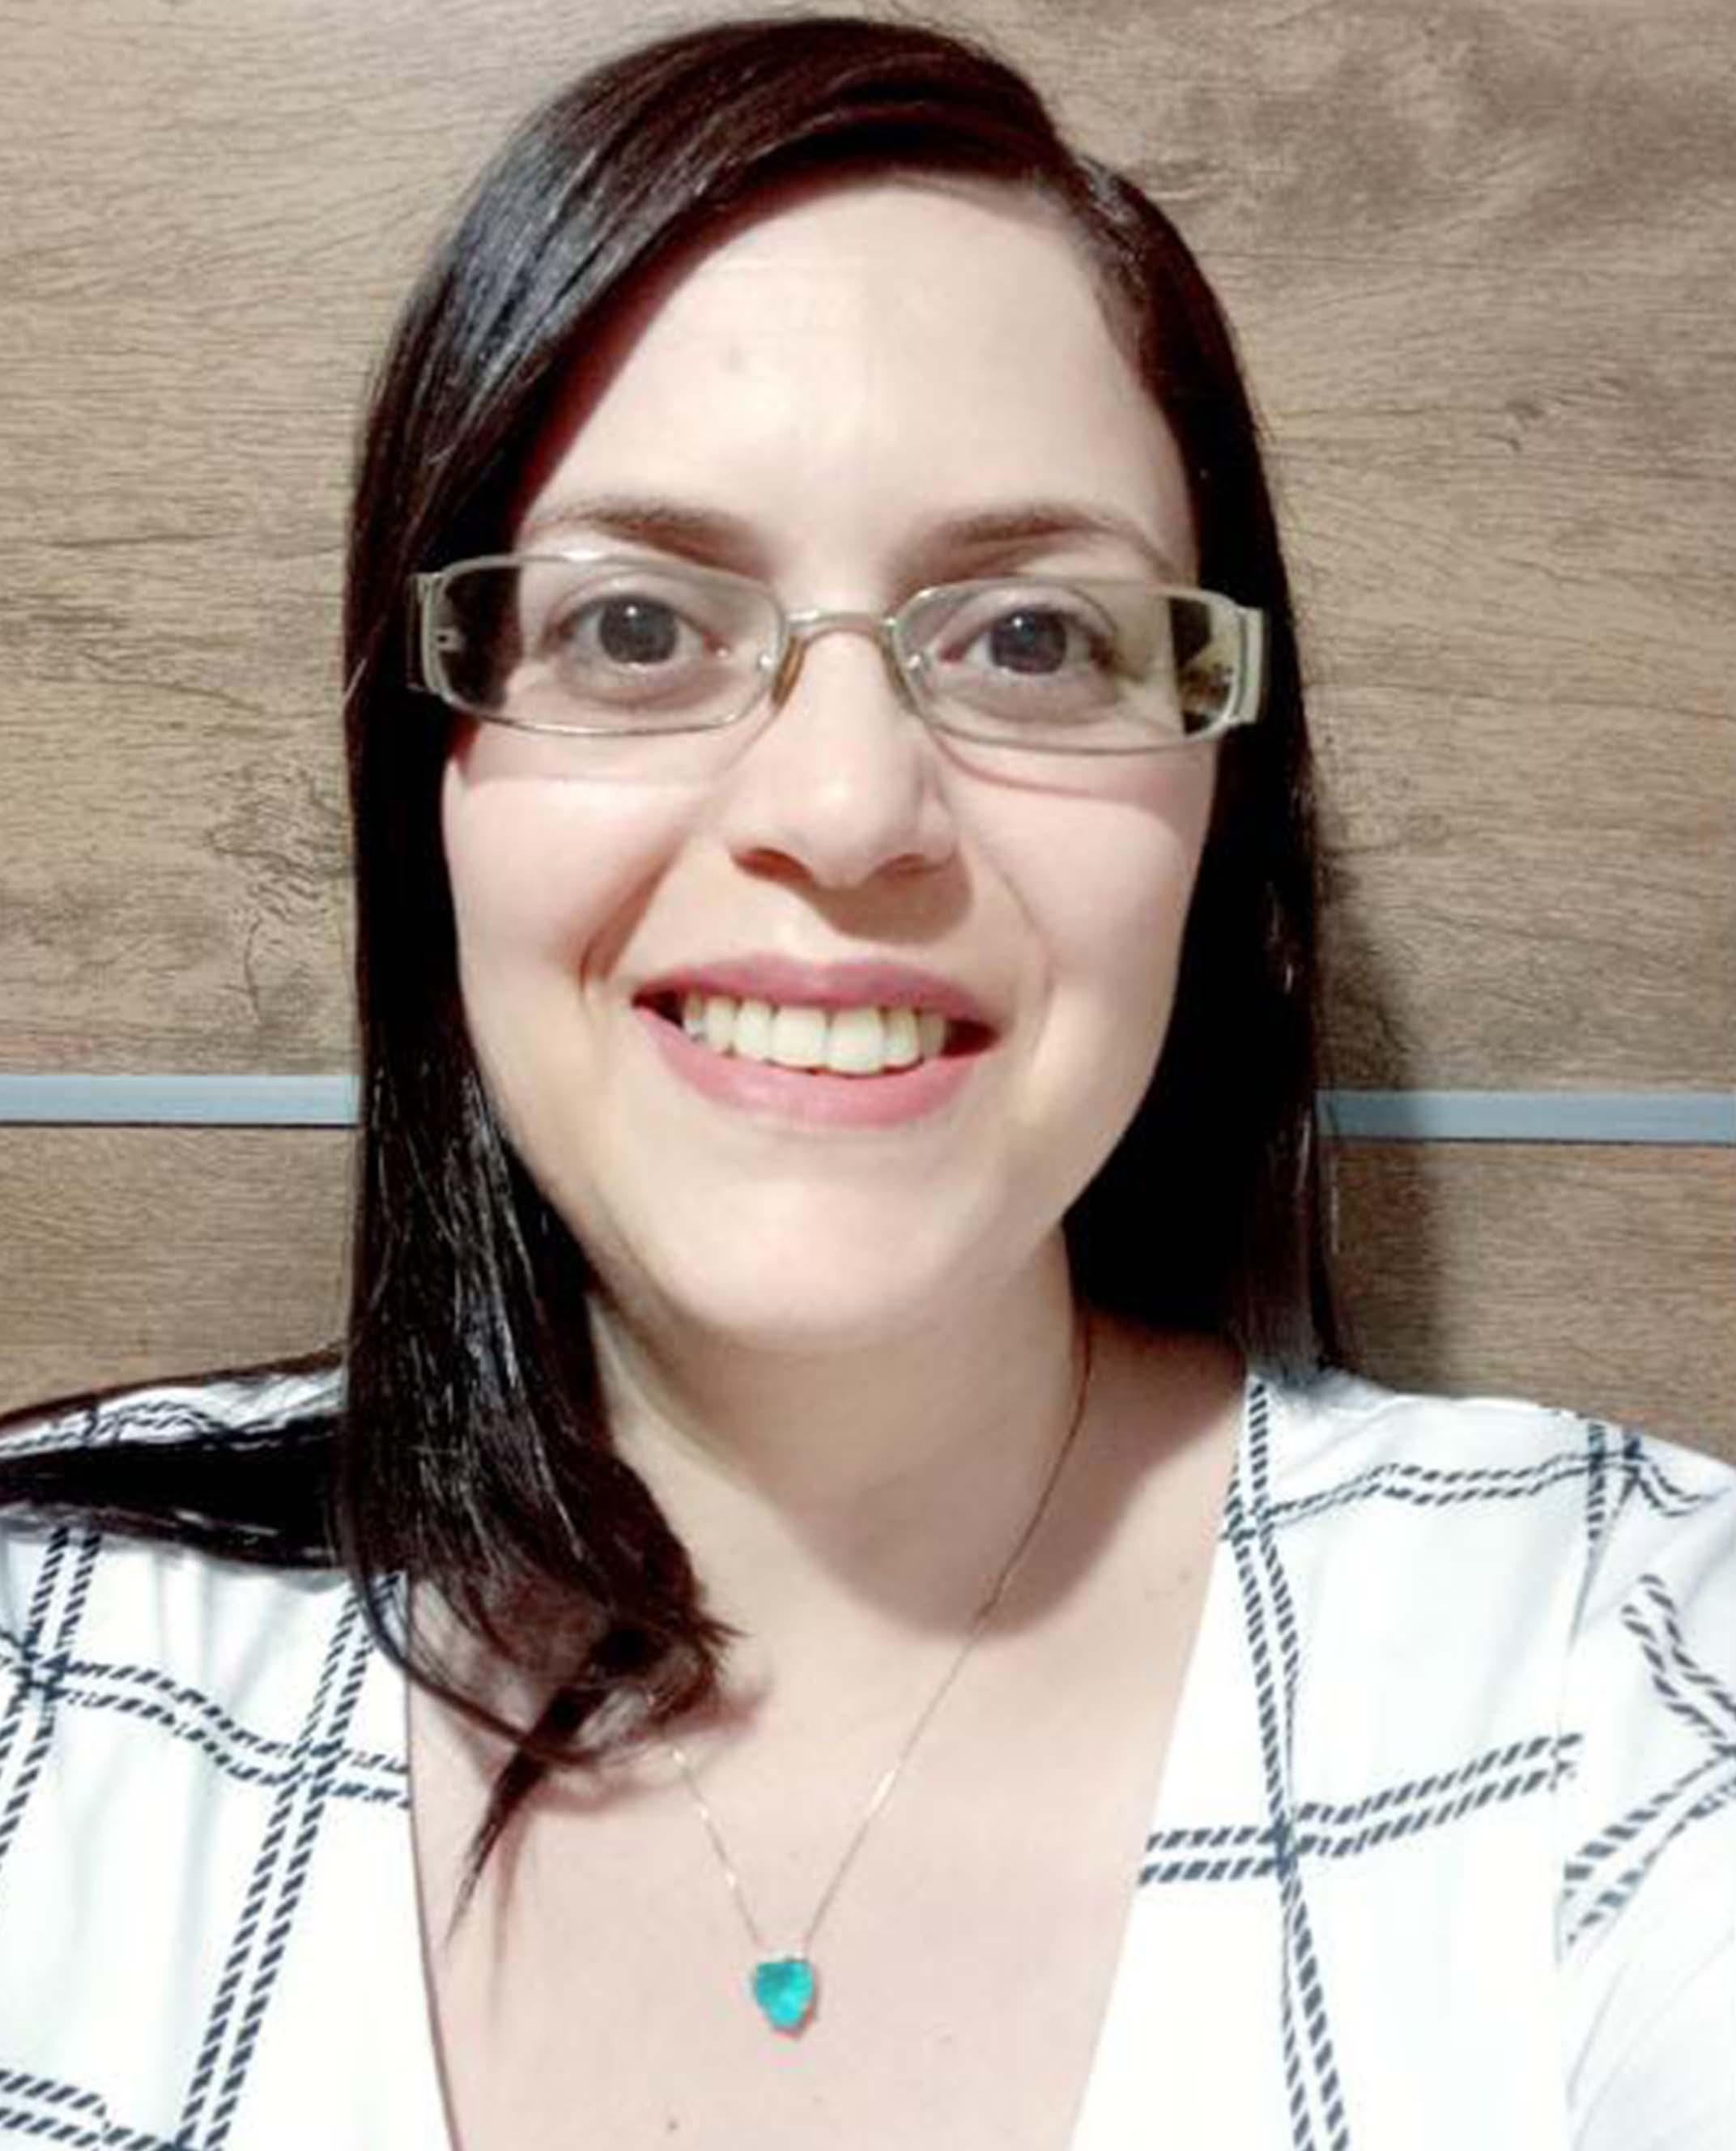 PATRICIA NAZARÉ ALVES - Projeto Semeador